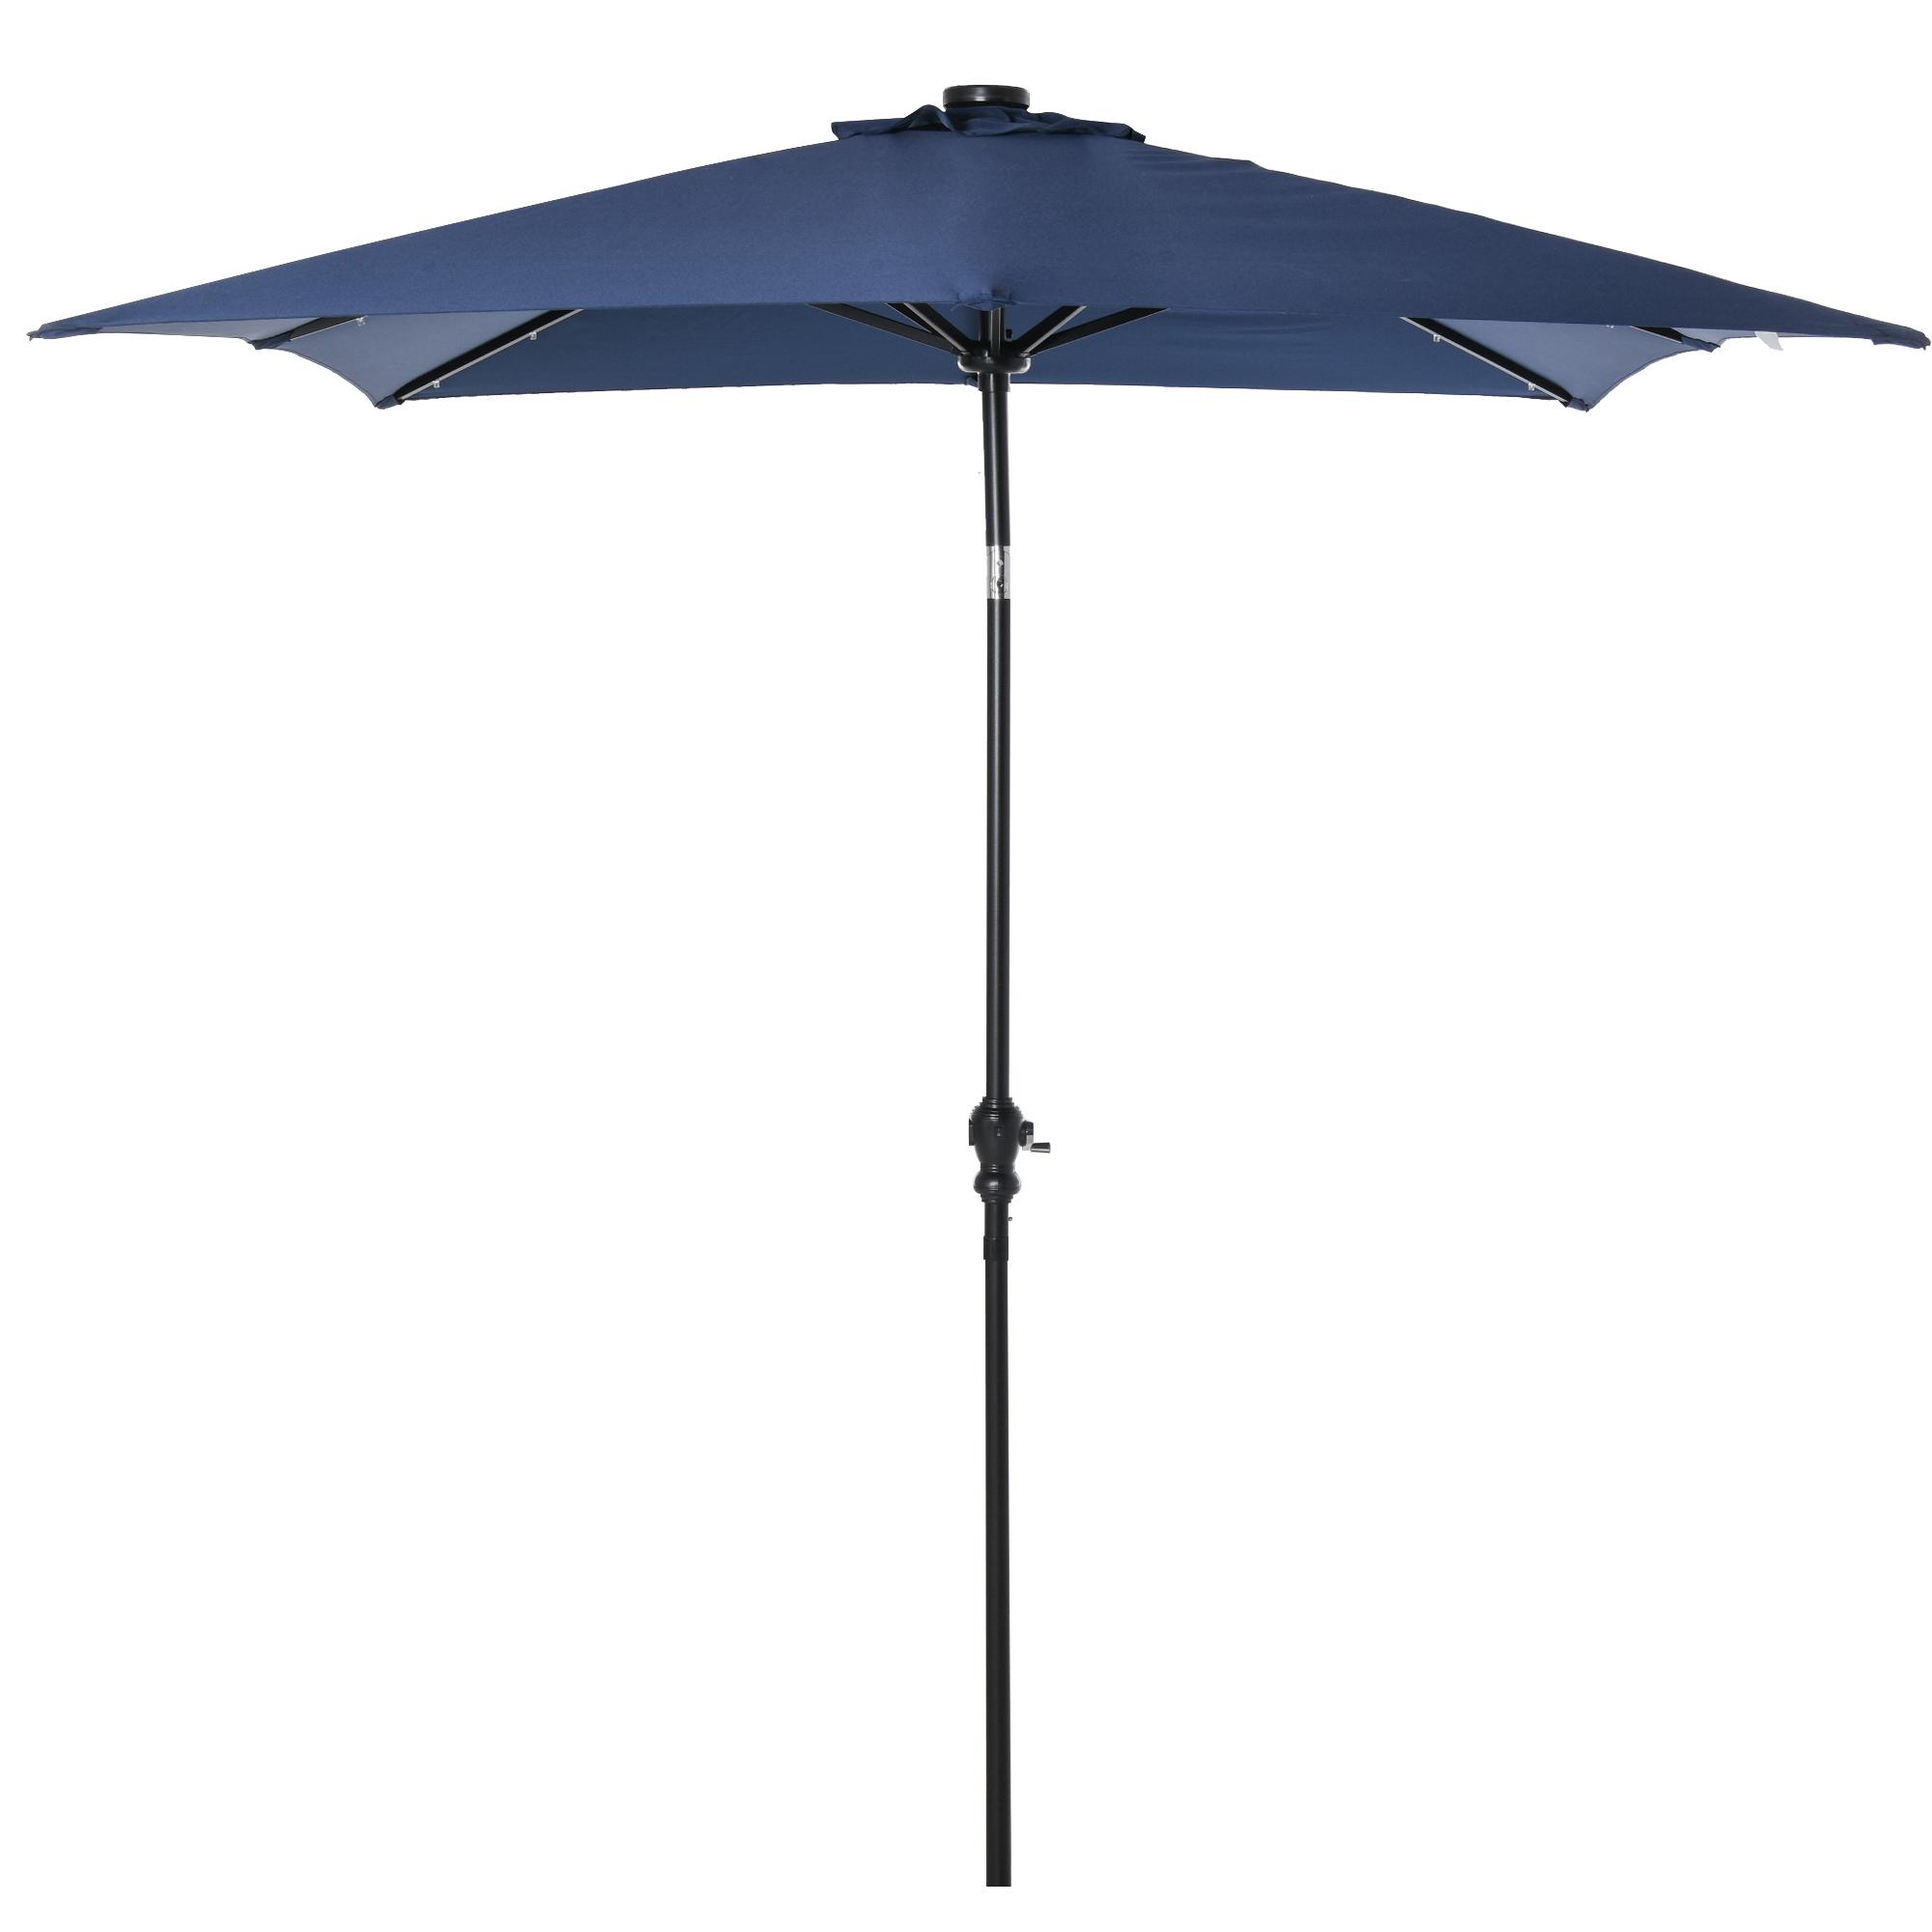 Parasol lumineux rectangulaire inclinable bleu